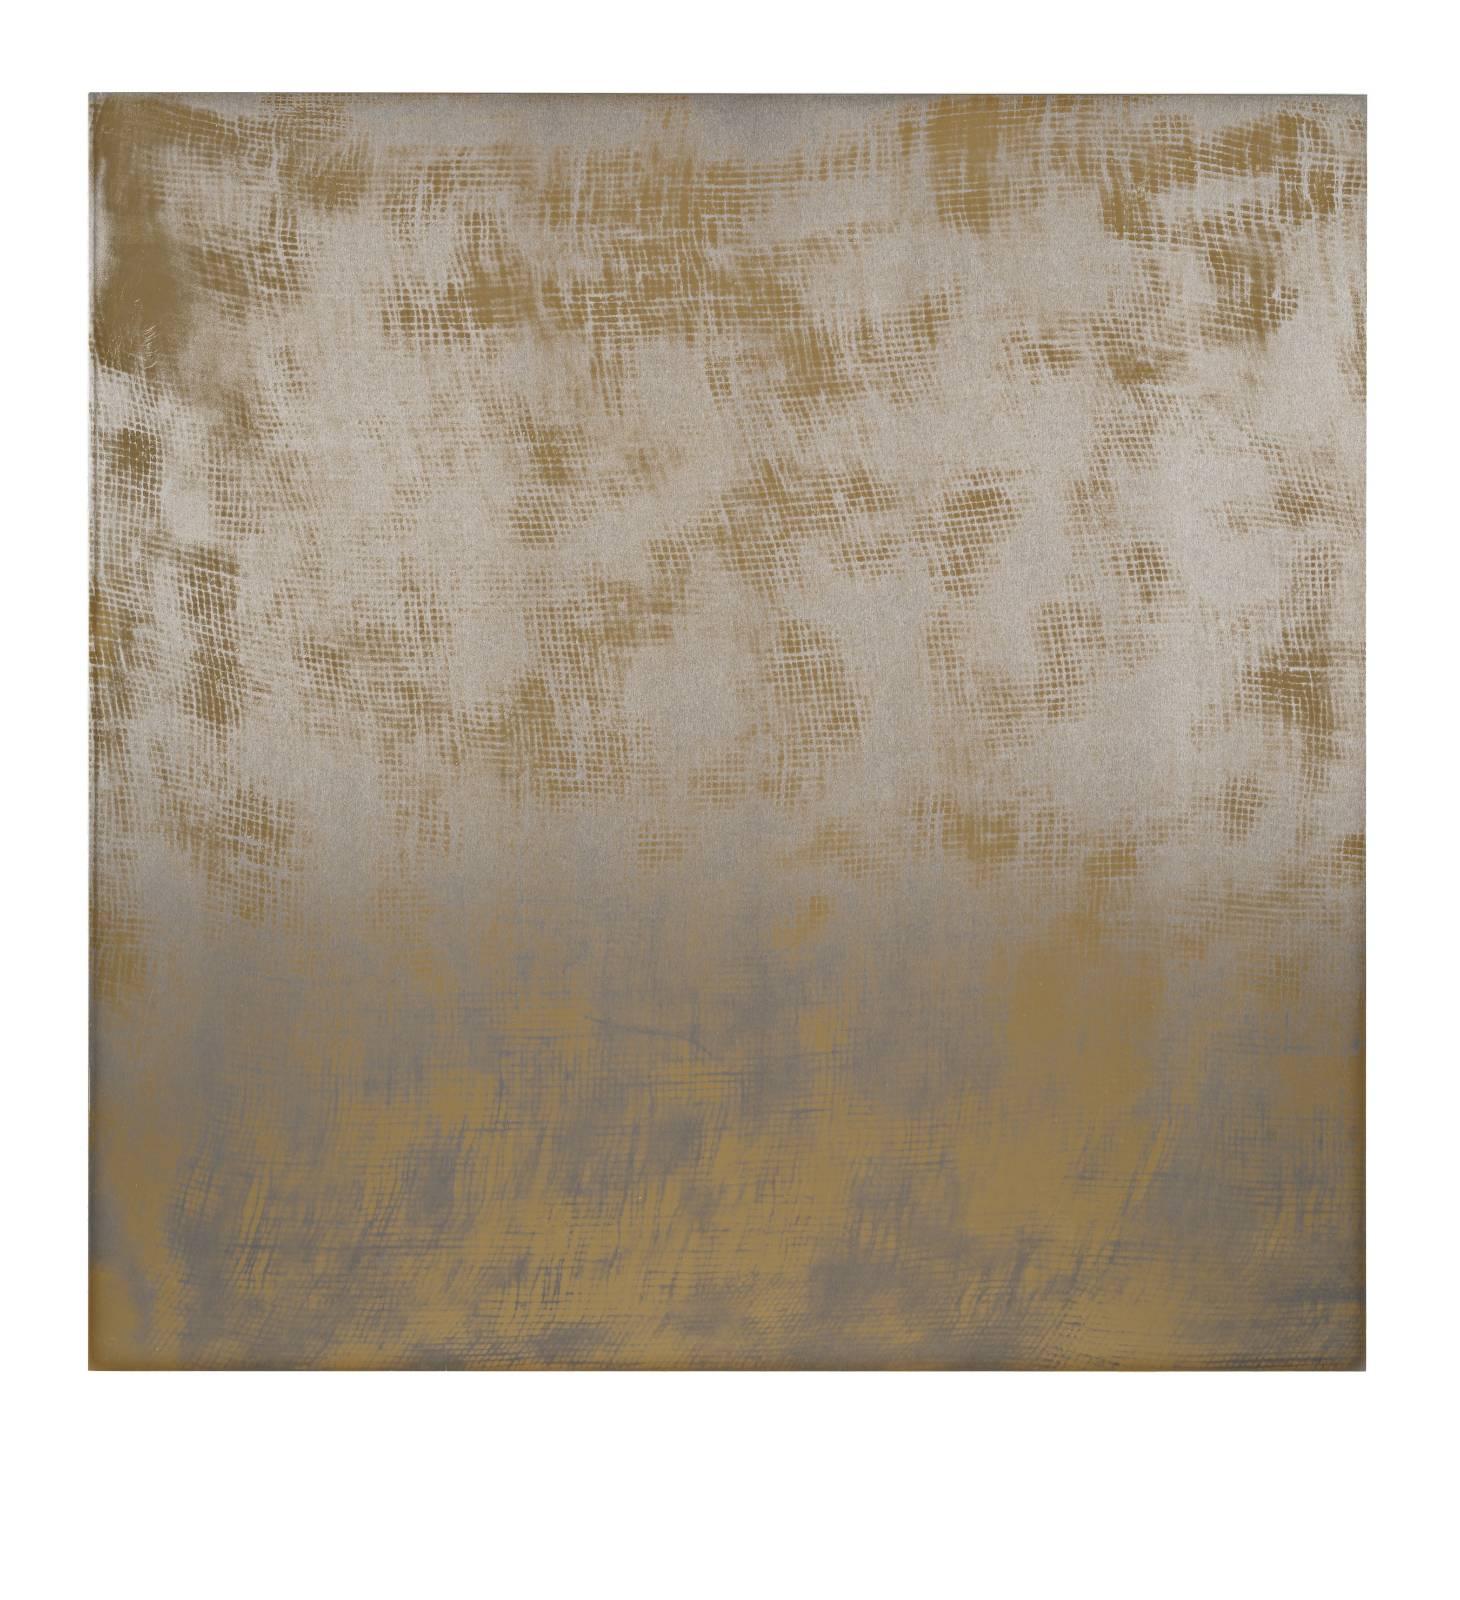 "STAIN : 40°42'54.9""N 73°56'27.4""W, 2015, spraypaint on aluminium, 81,3 x 81,3 cm"